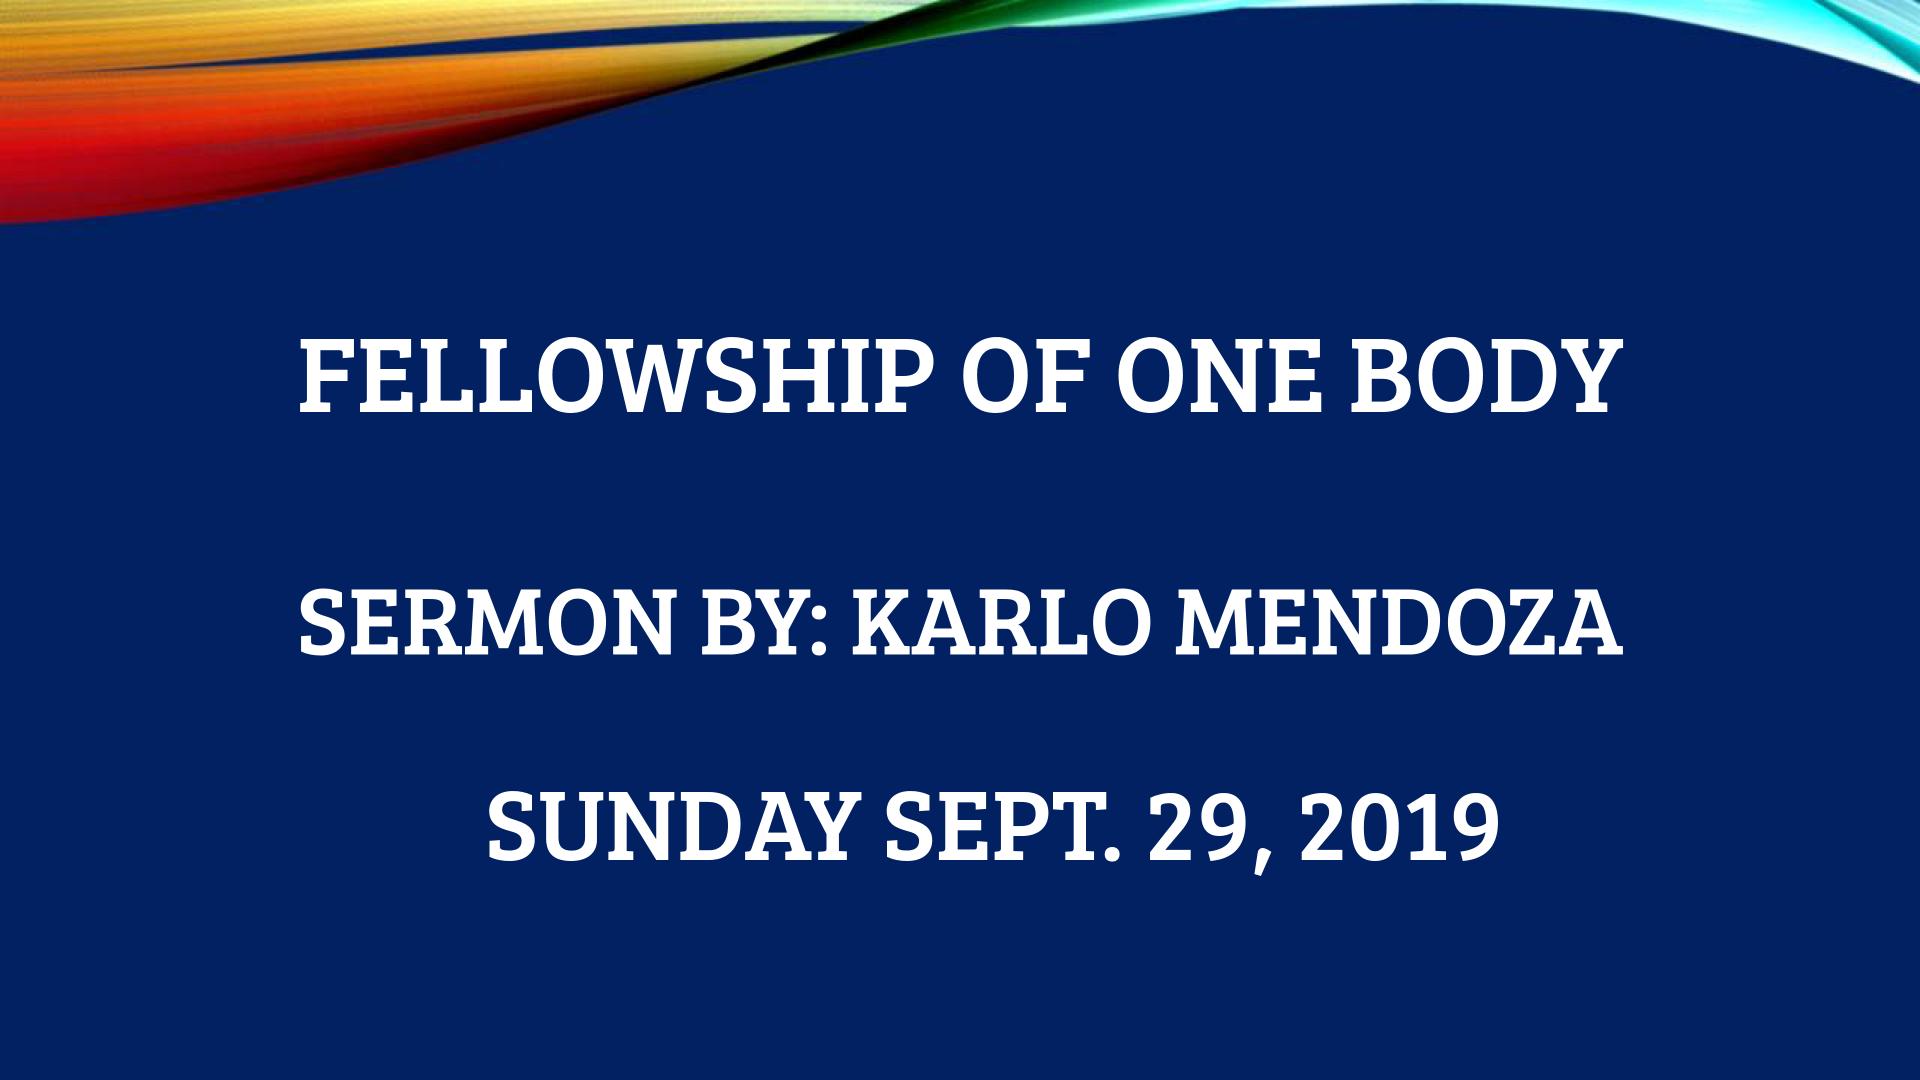 Fellowship of One Body